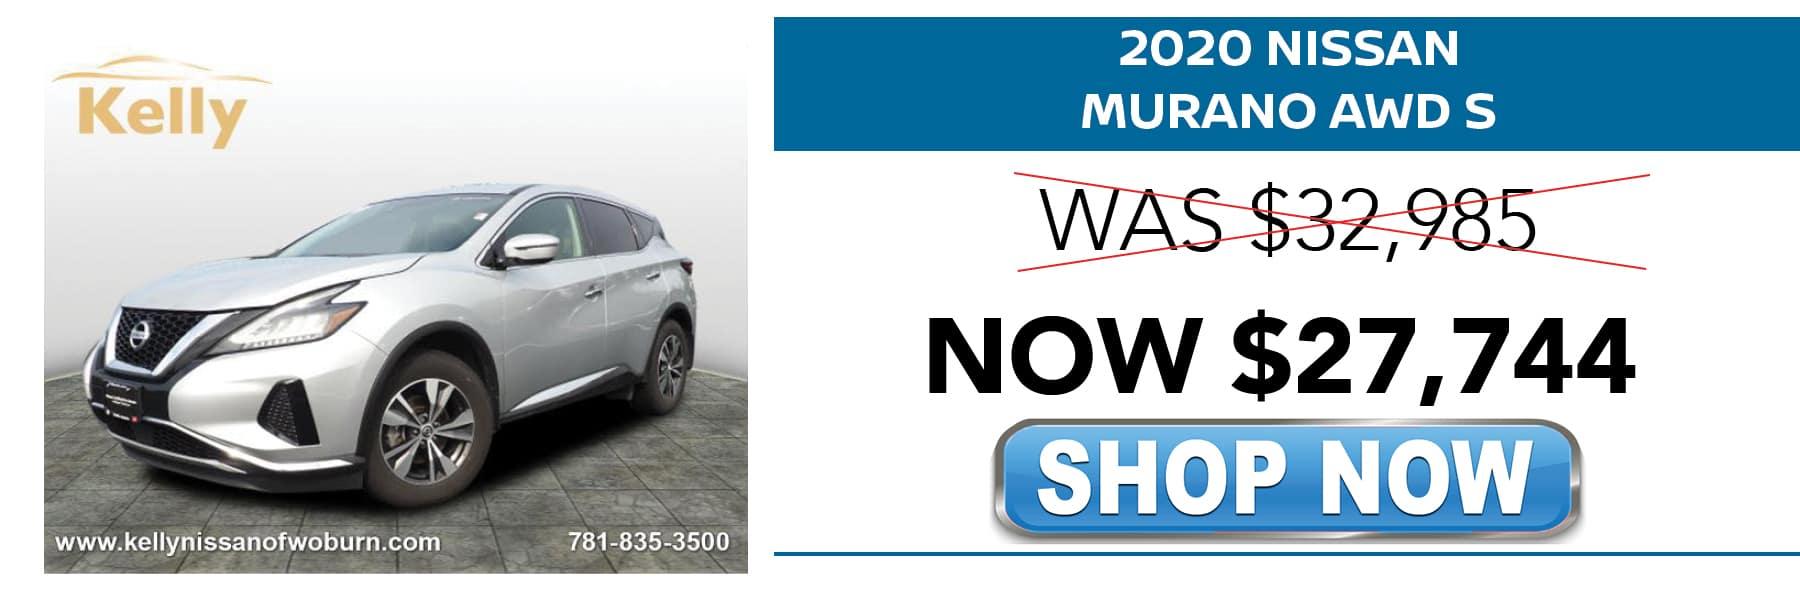 2020 Nissan Murano S Now $27,744